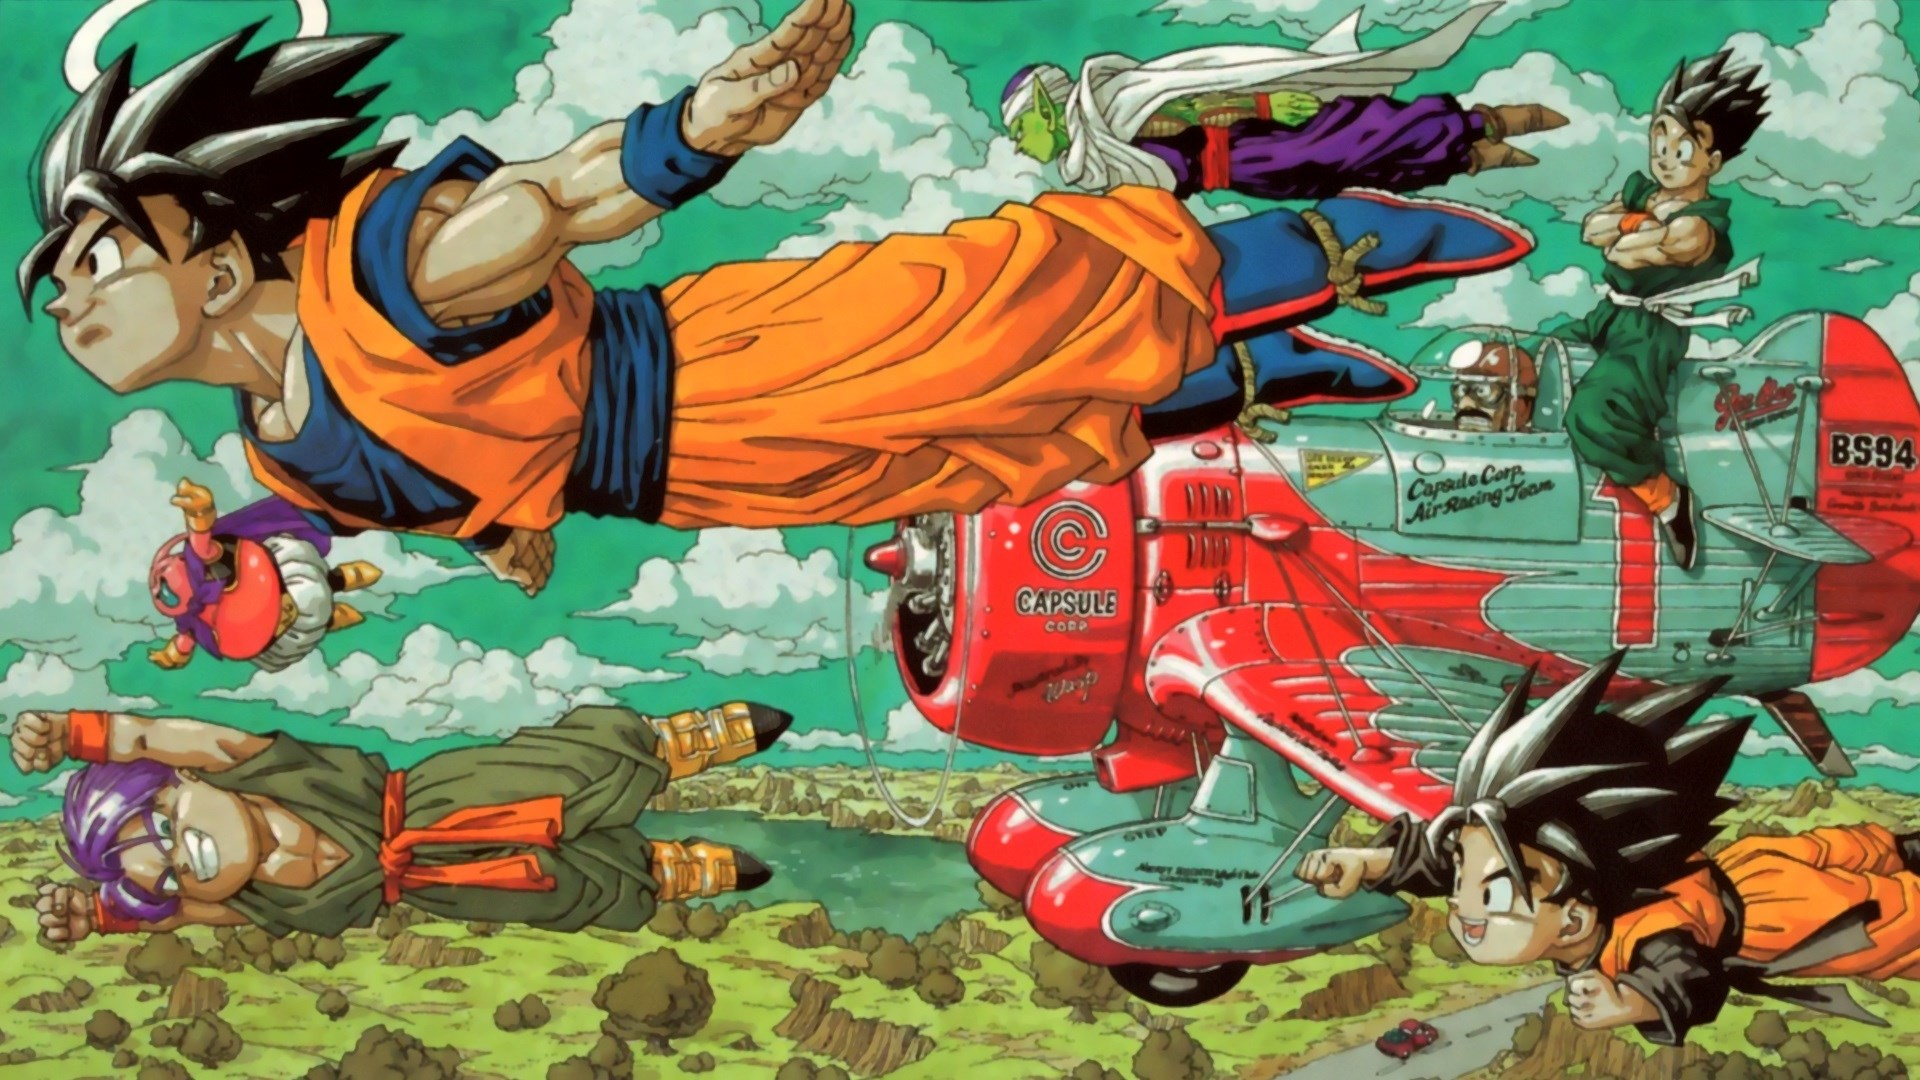 Dragon Ball Z Photo.   Akira Toriyama Art Style   Pinterest   Dragon ball,  Dragons and Hd wallpaper